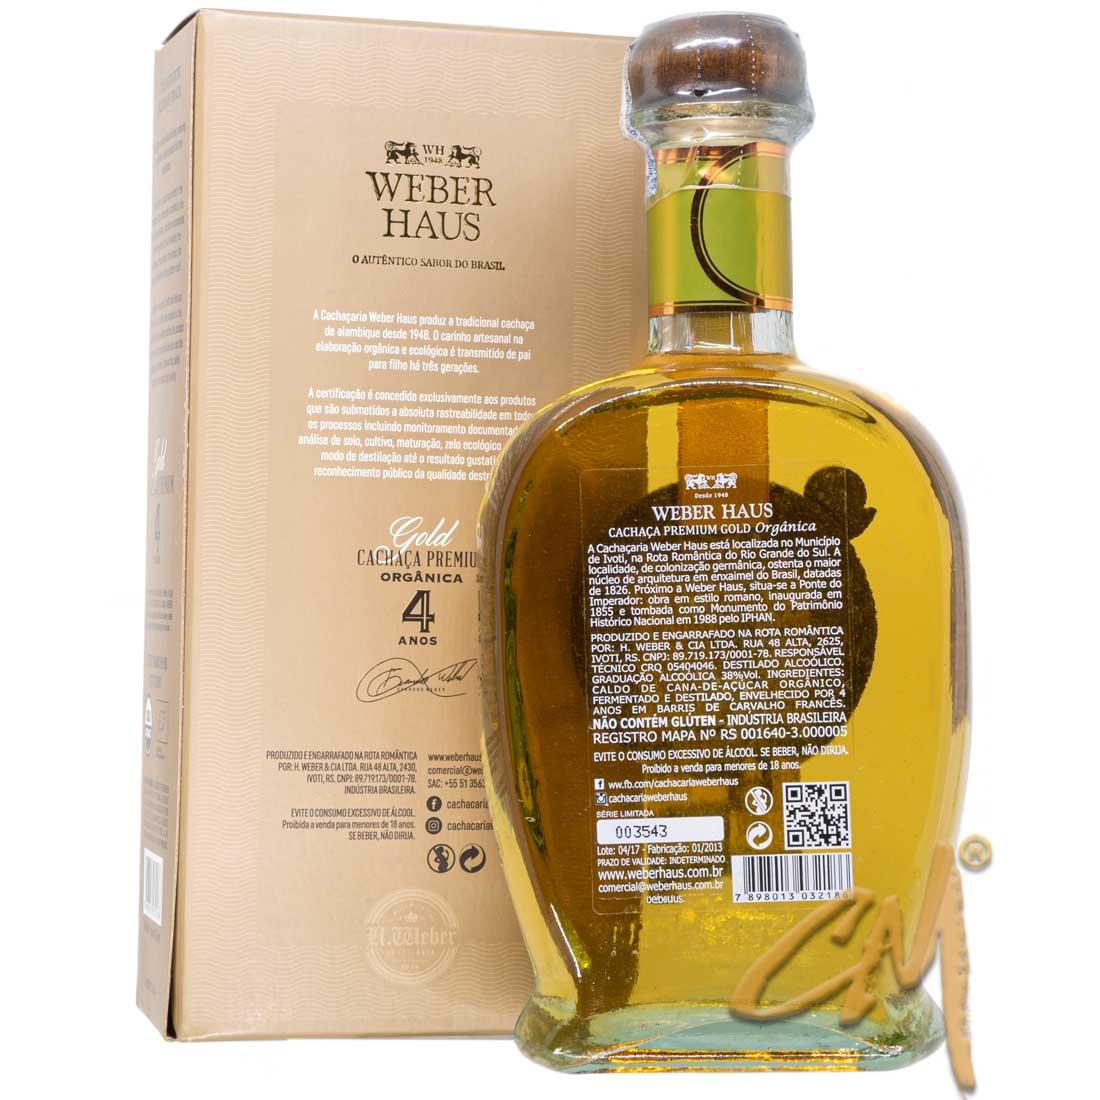 Cachaça Weber Haus Premium 4 Anos Orgânica Ouro 750 ml (Ivoti - RS)